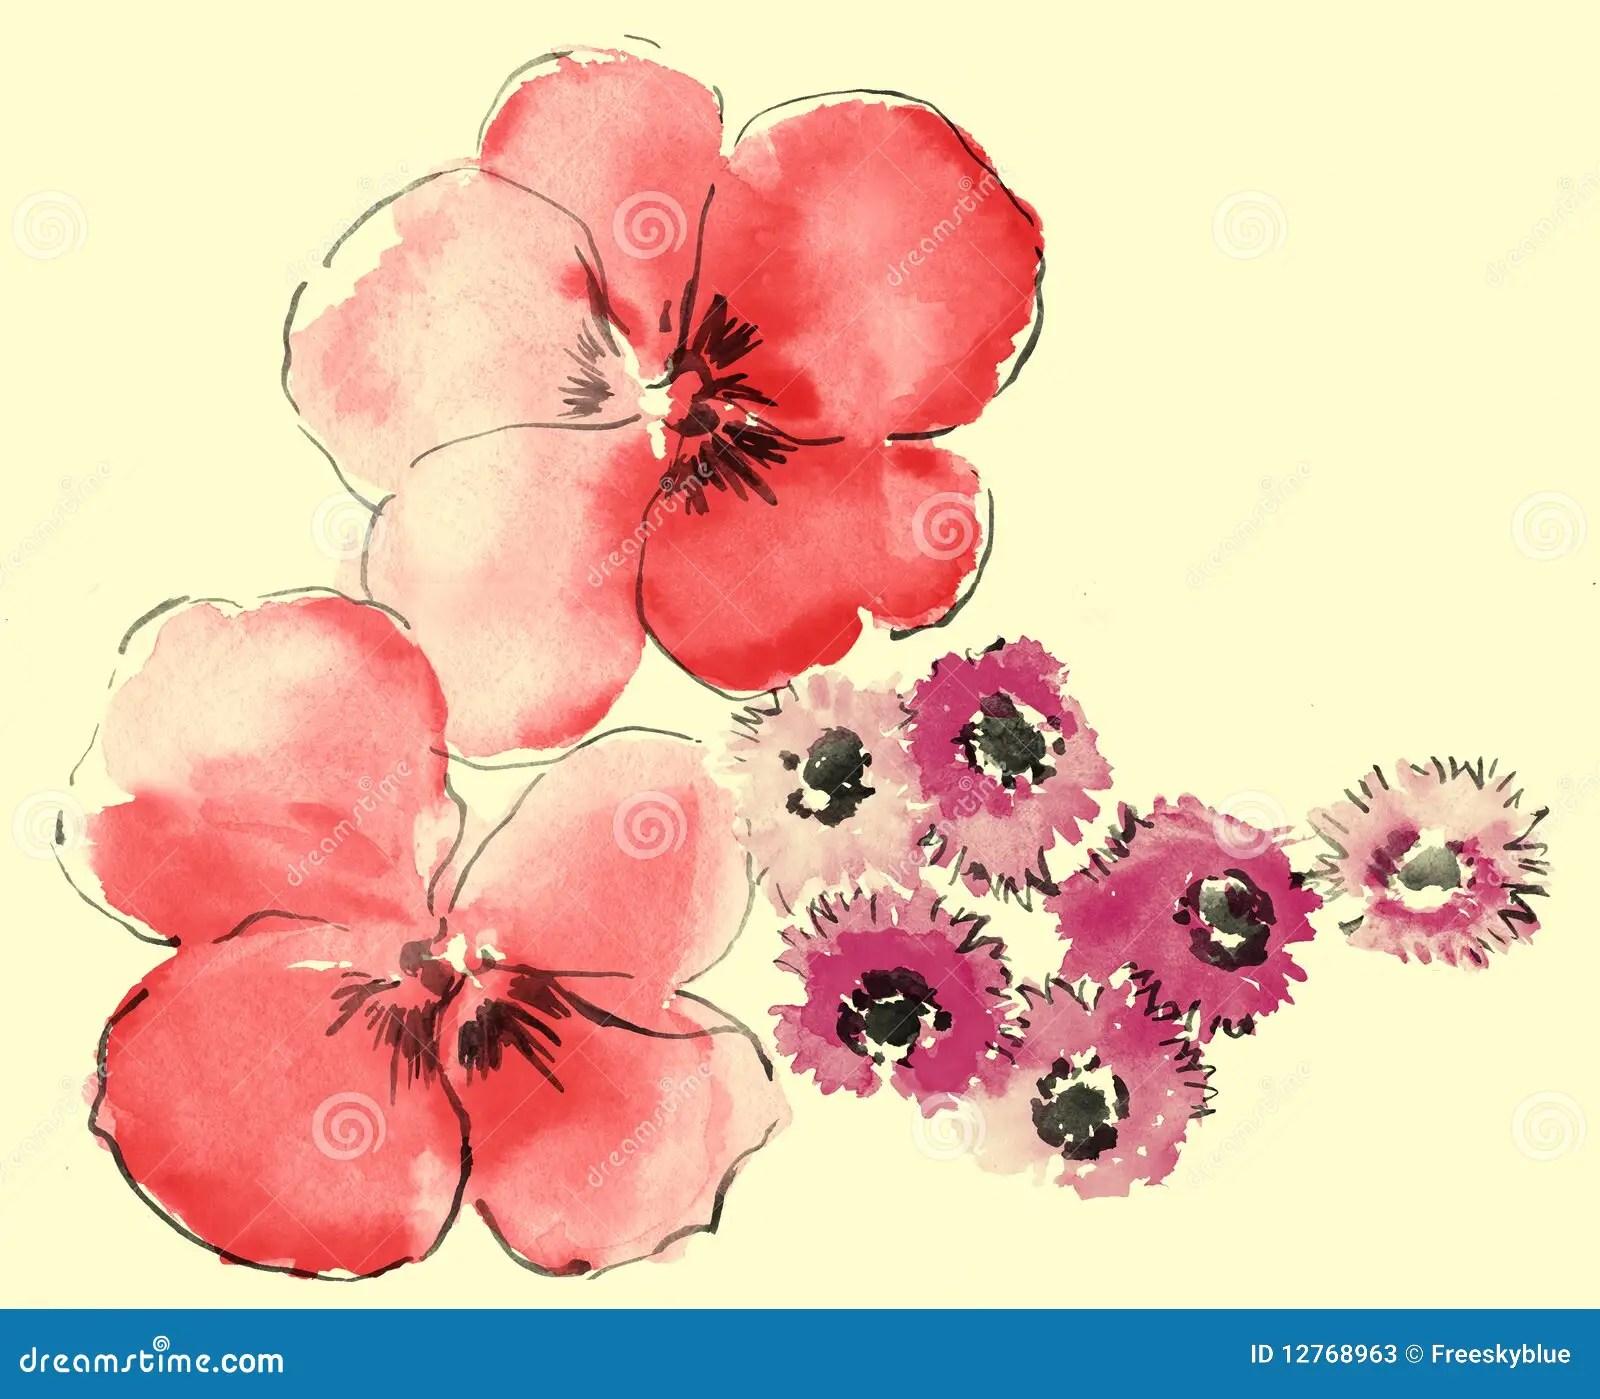 3d Cherry Blossom Wallpaper Watercolor Of Daisy And Sakura Stock Photos Image 12768963